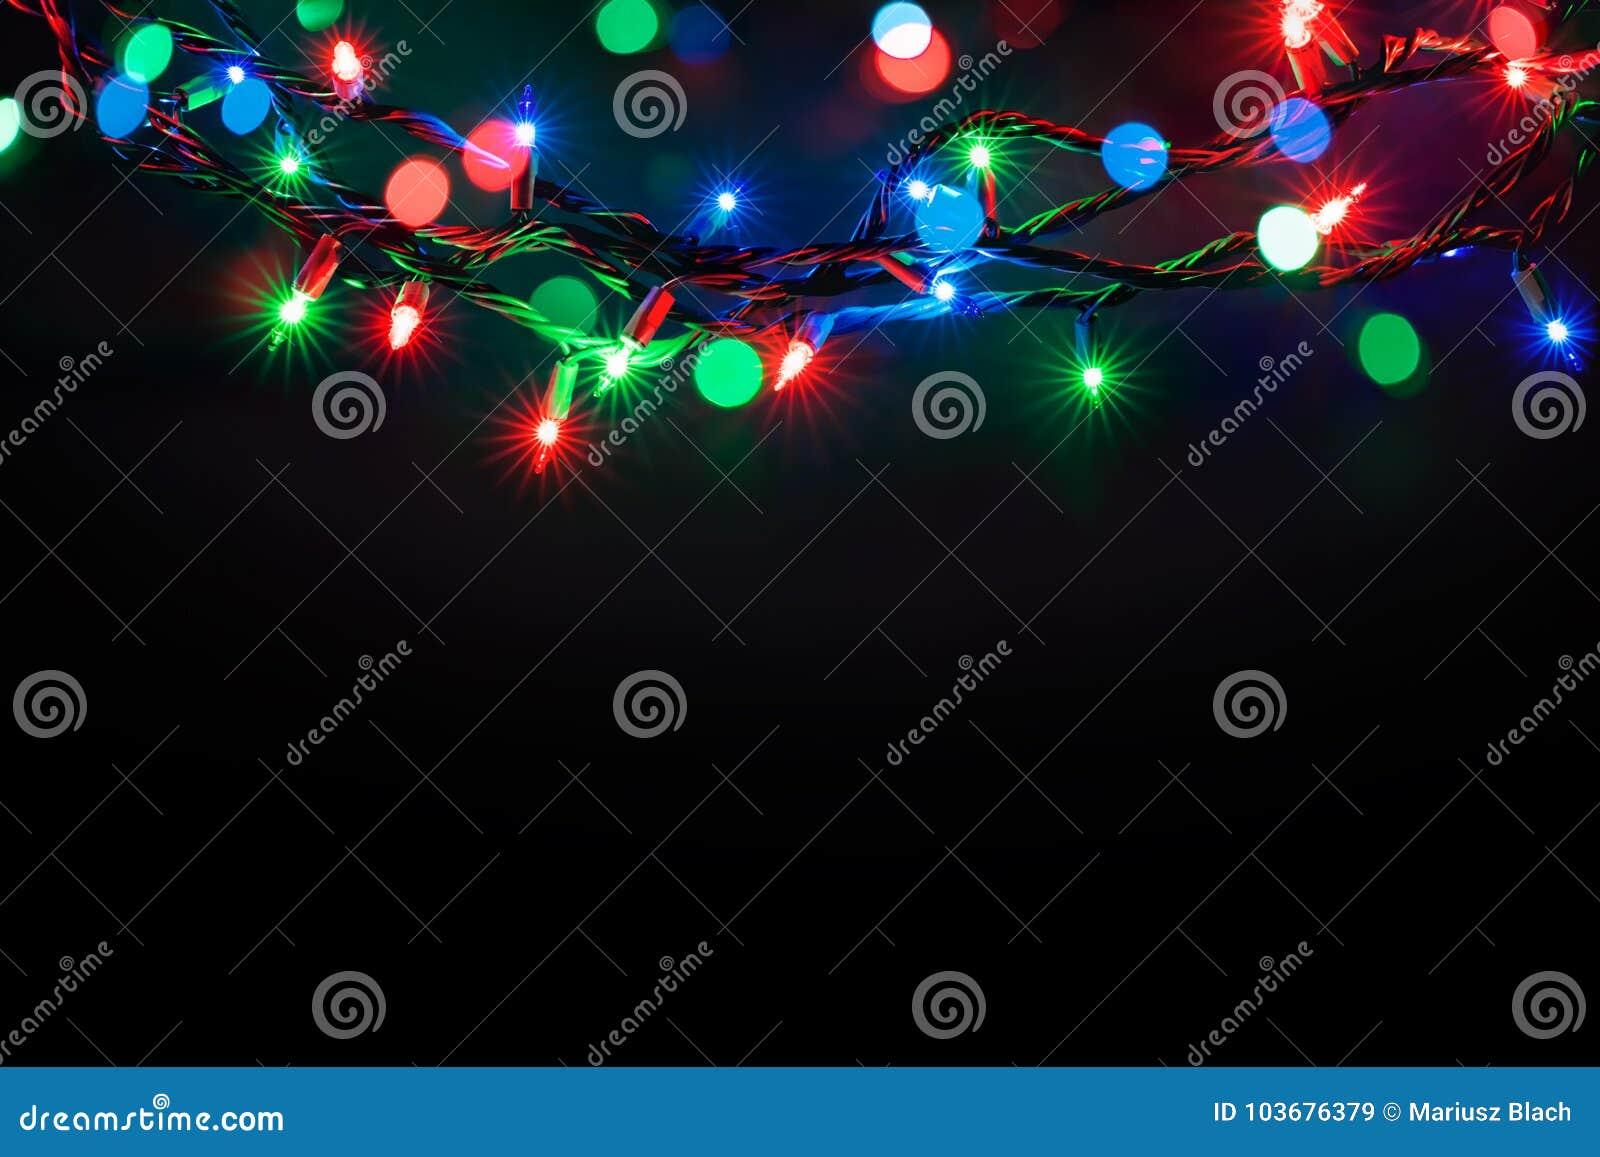 Christmas lights over black background